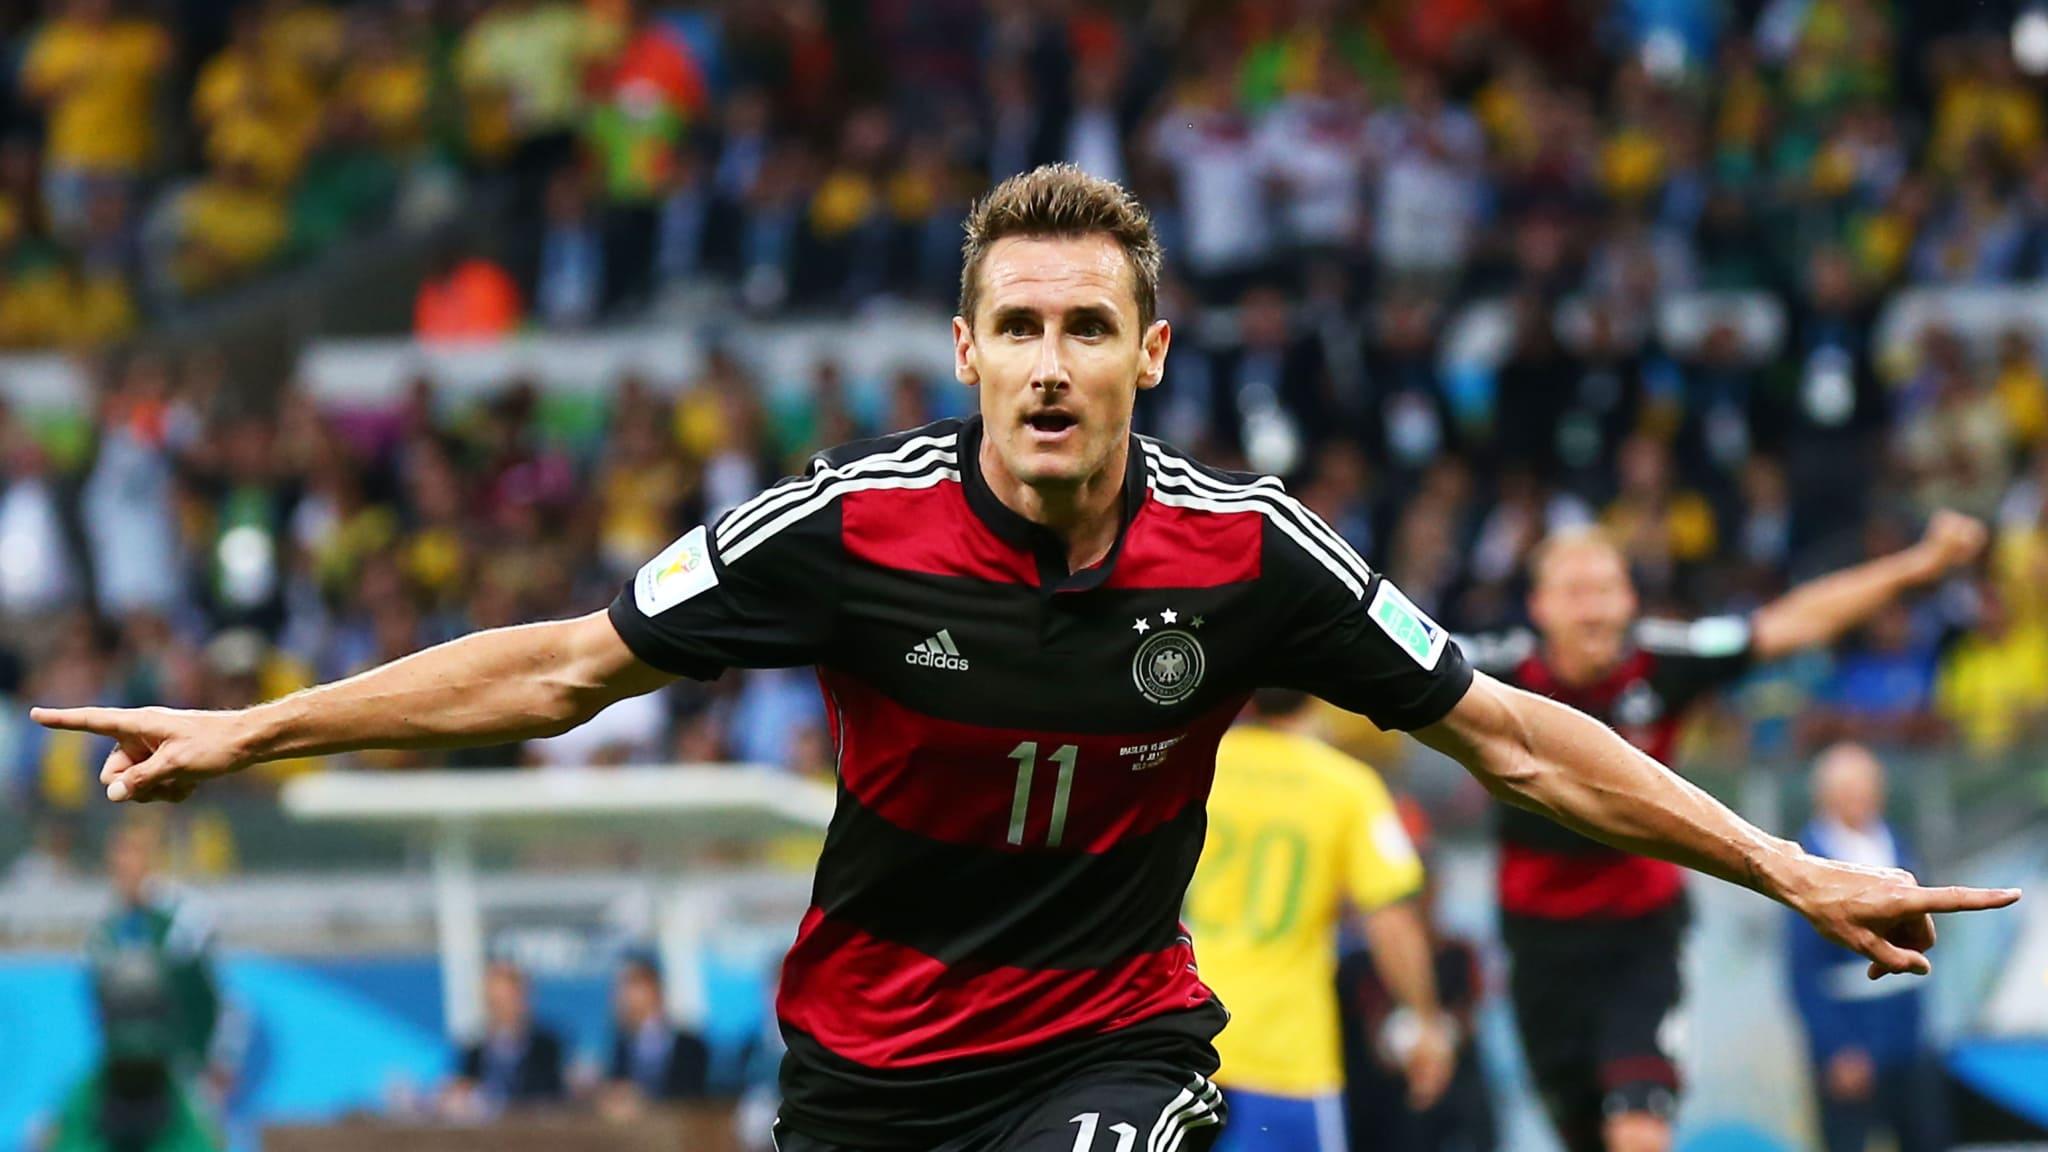 Kisah Menarik Dari Miroslav Klose